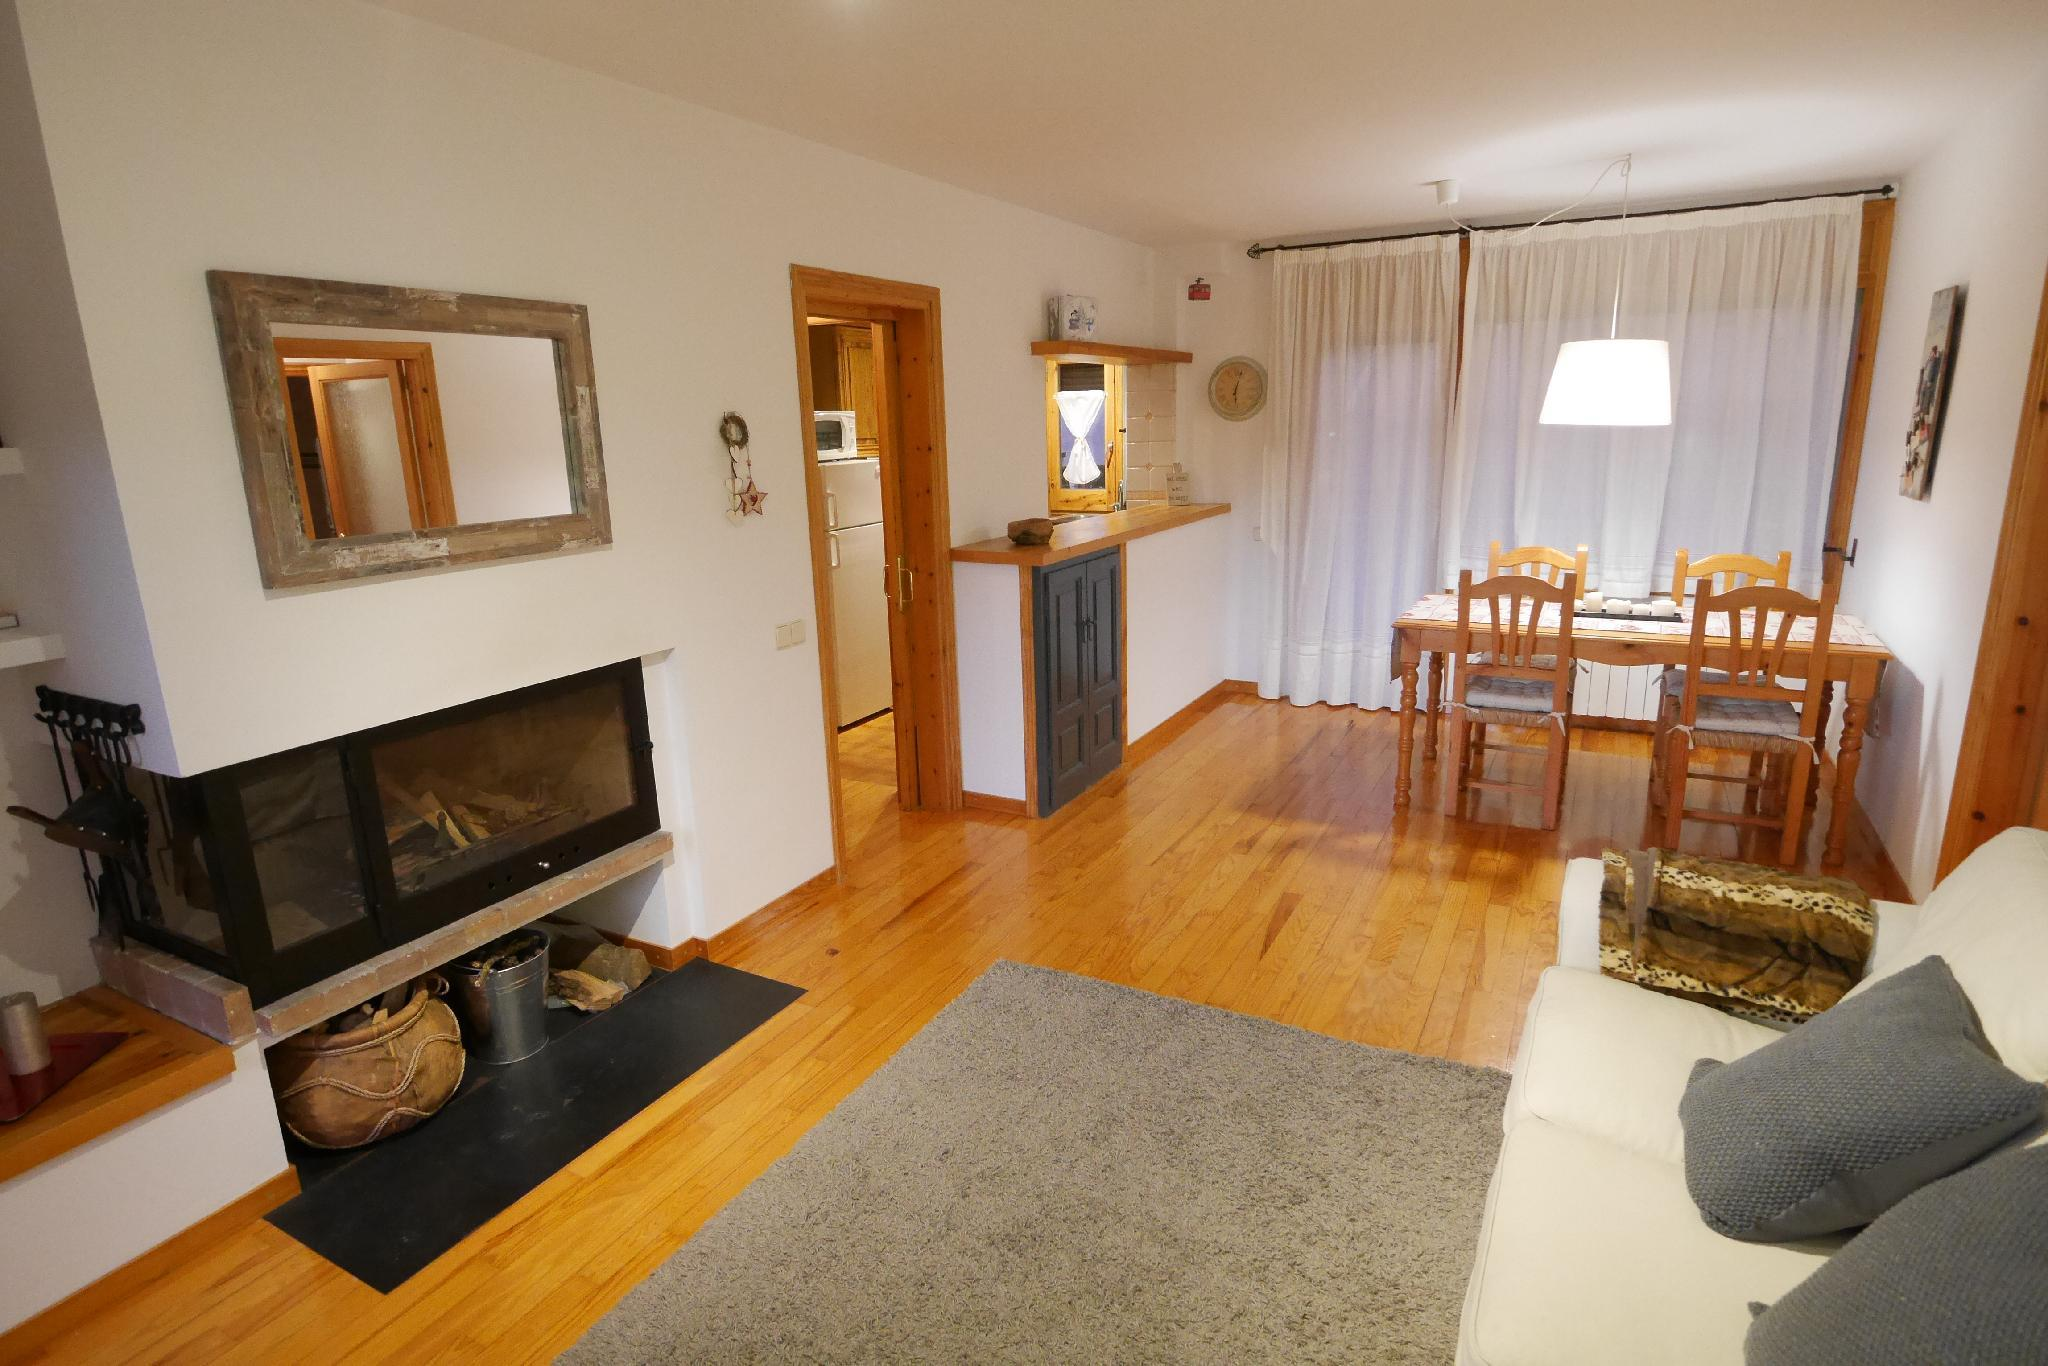 Cozy Renewed Apartment In Alp With Garden